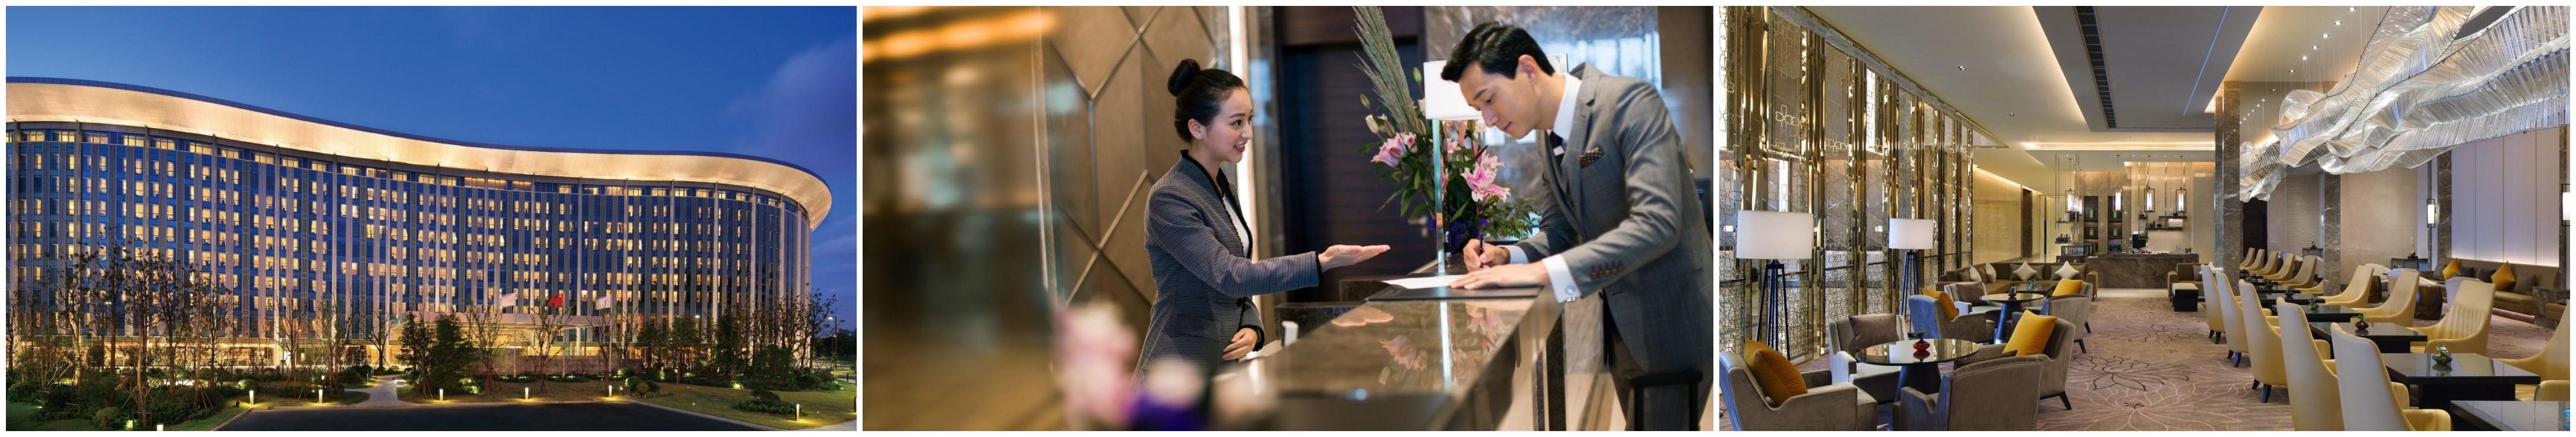 InterContinental shanghai NECC